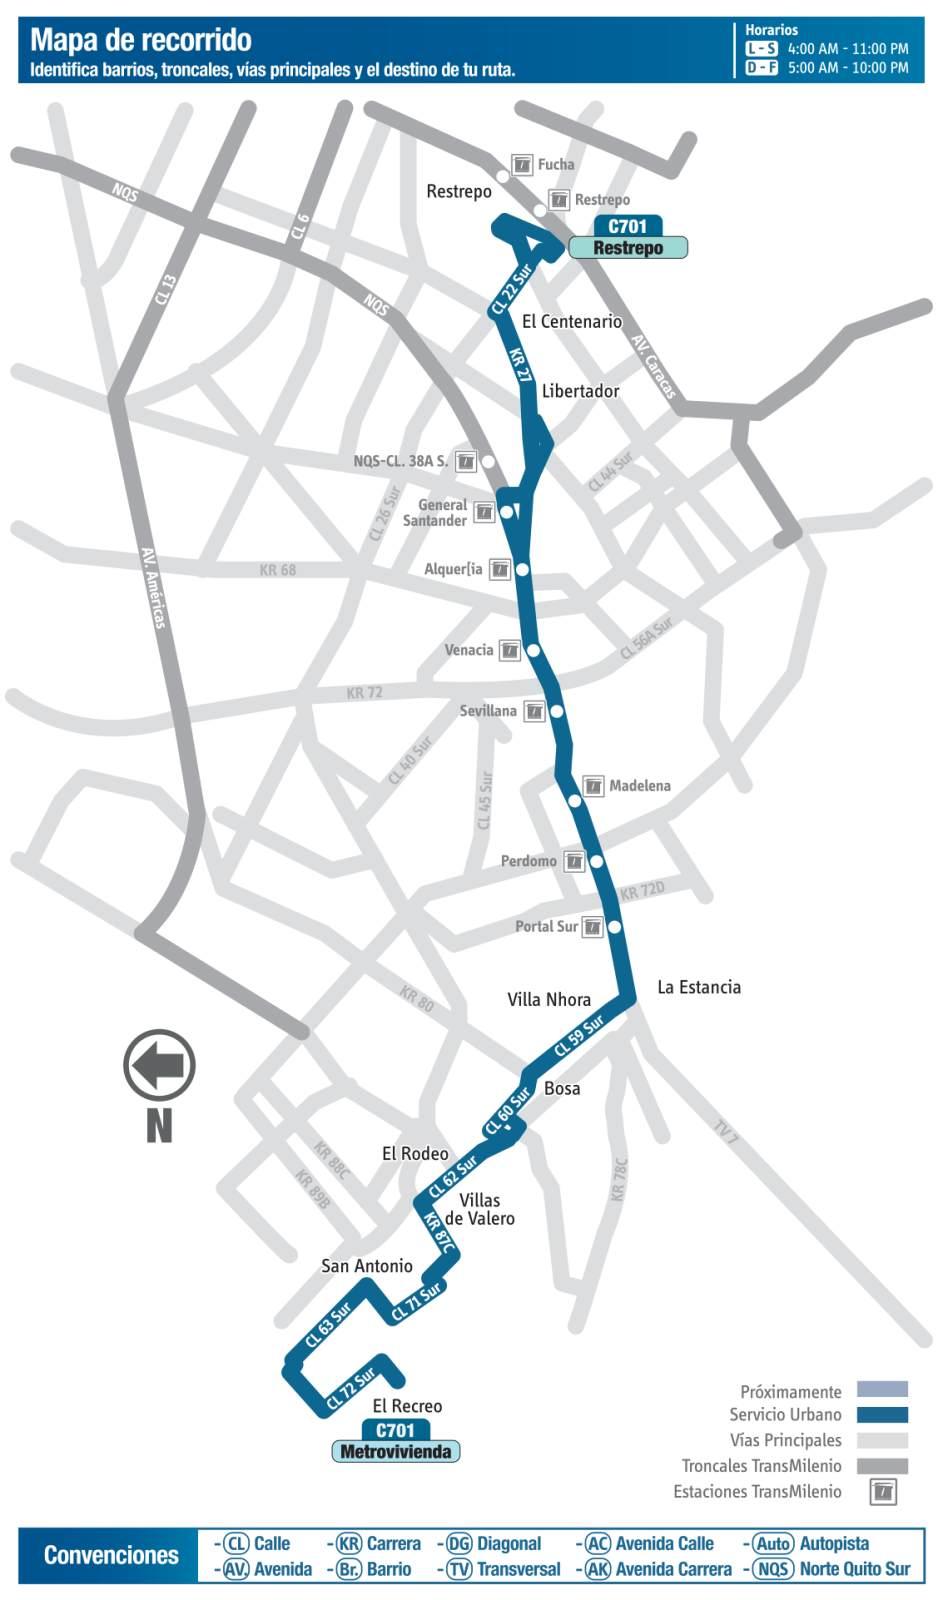 Ruta SITP: C701 Metrovivienda ↔ Restrepo (mapa)